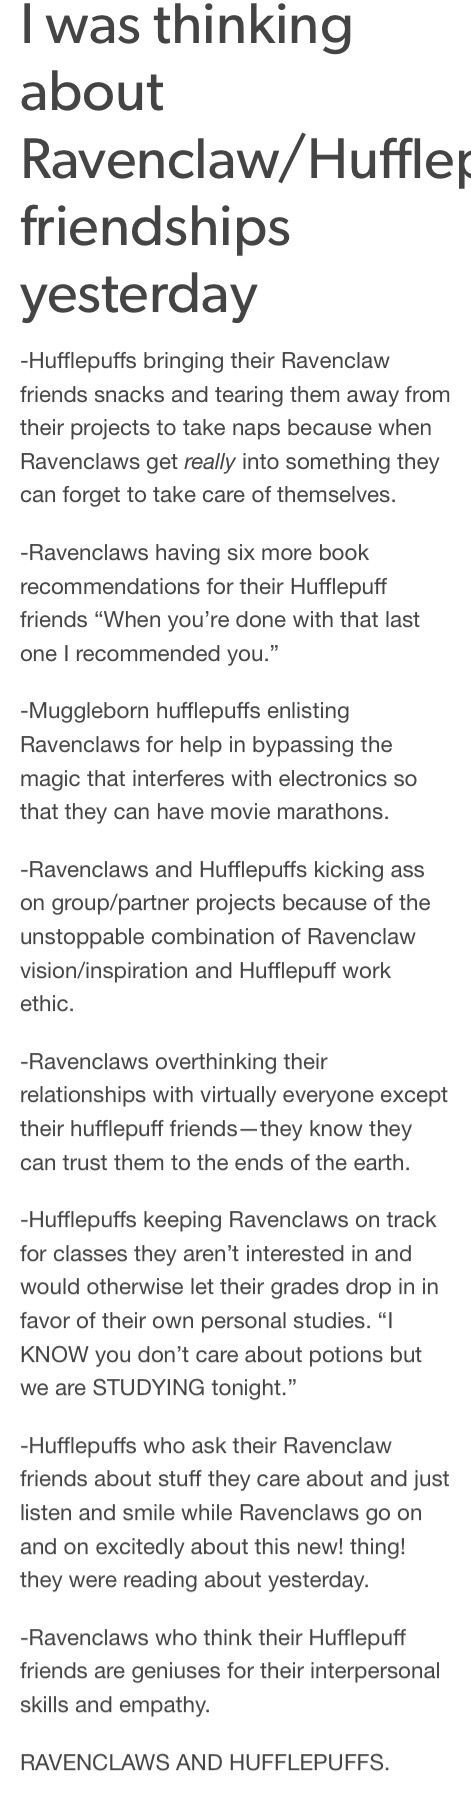 Image result for ravenclaw and gryffindor friendship